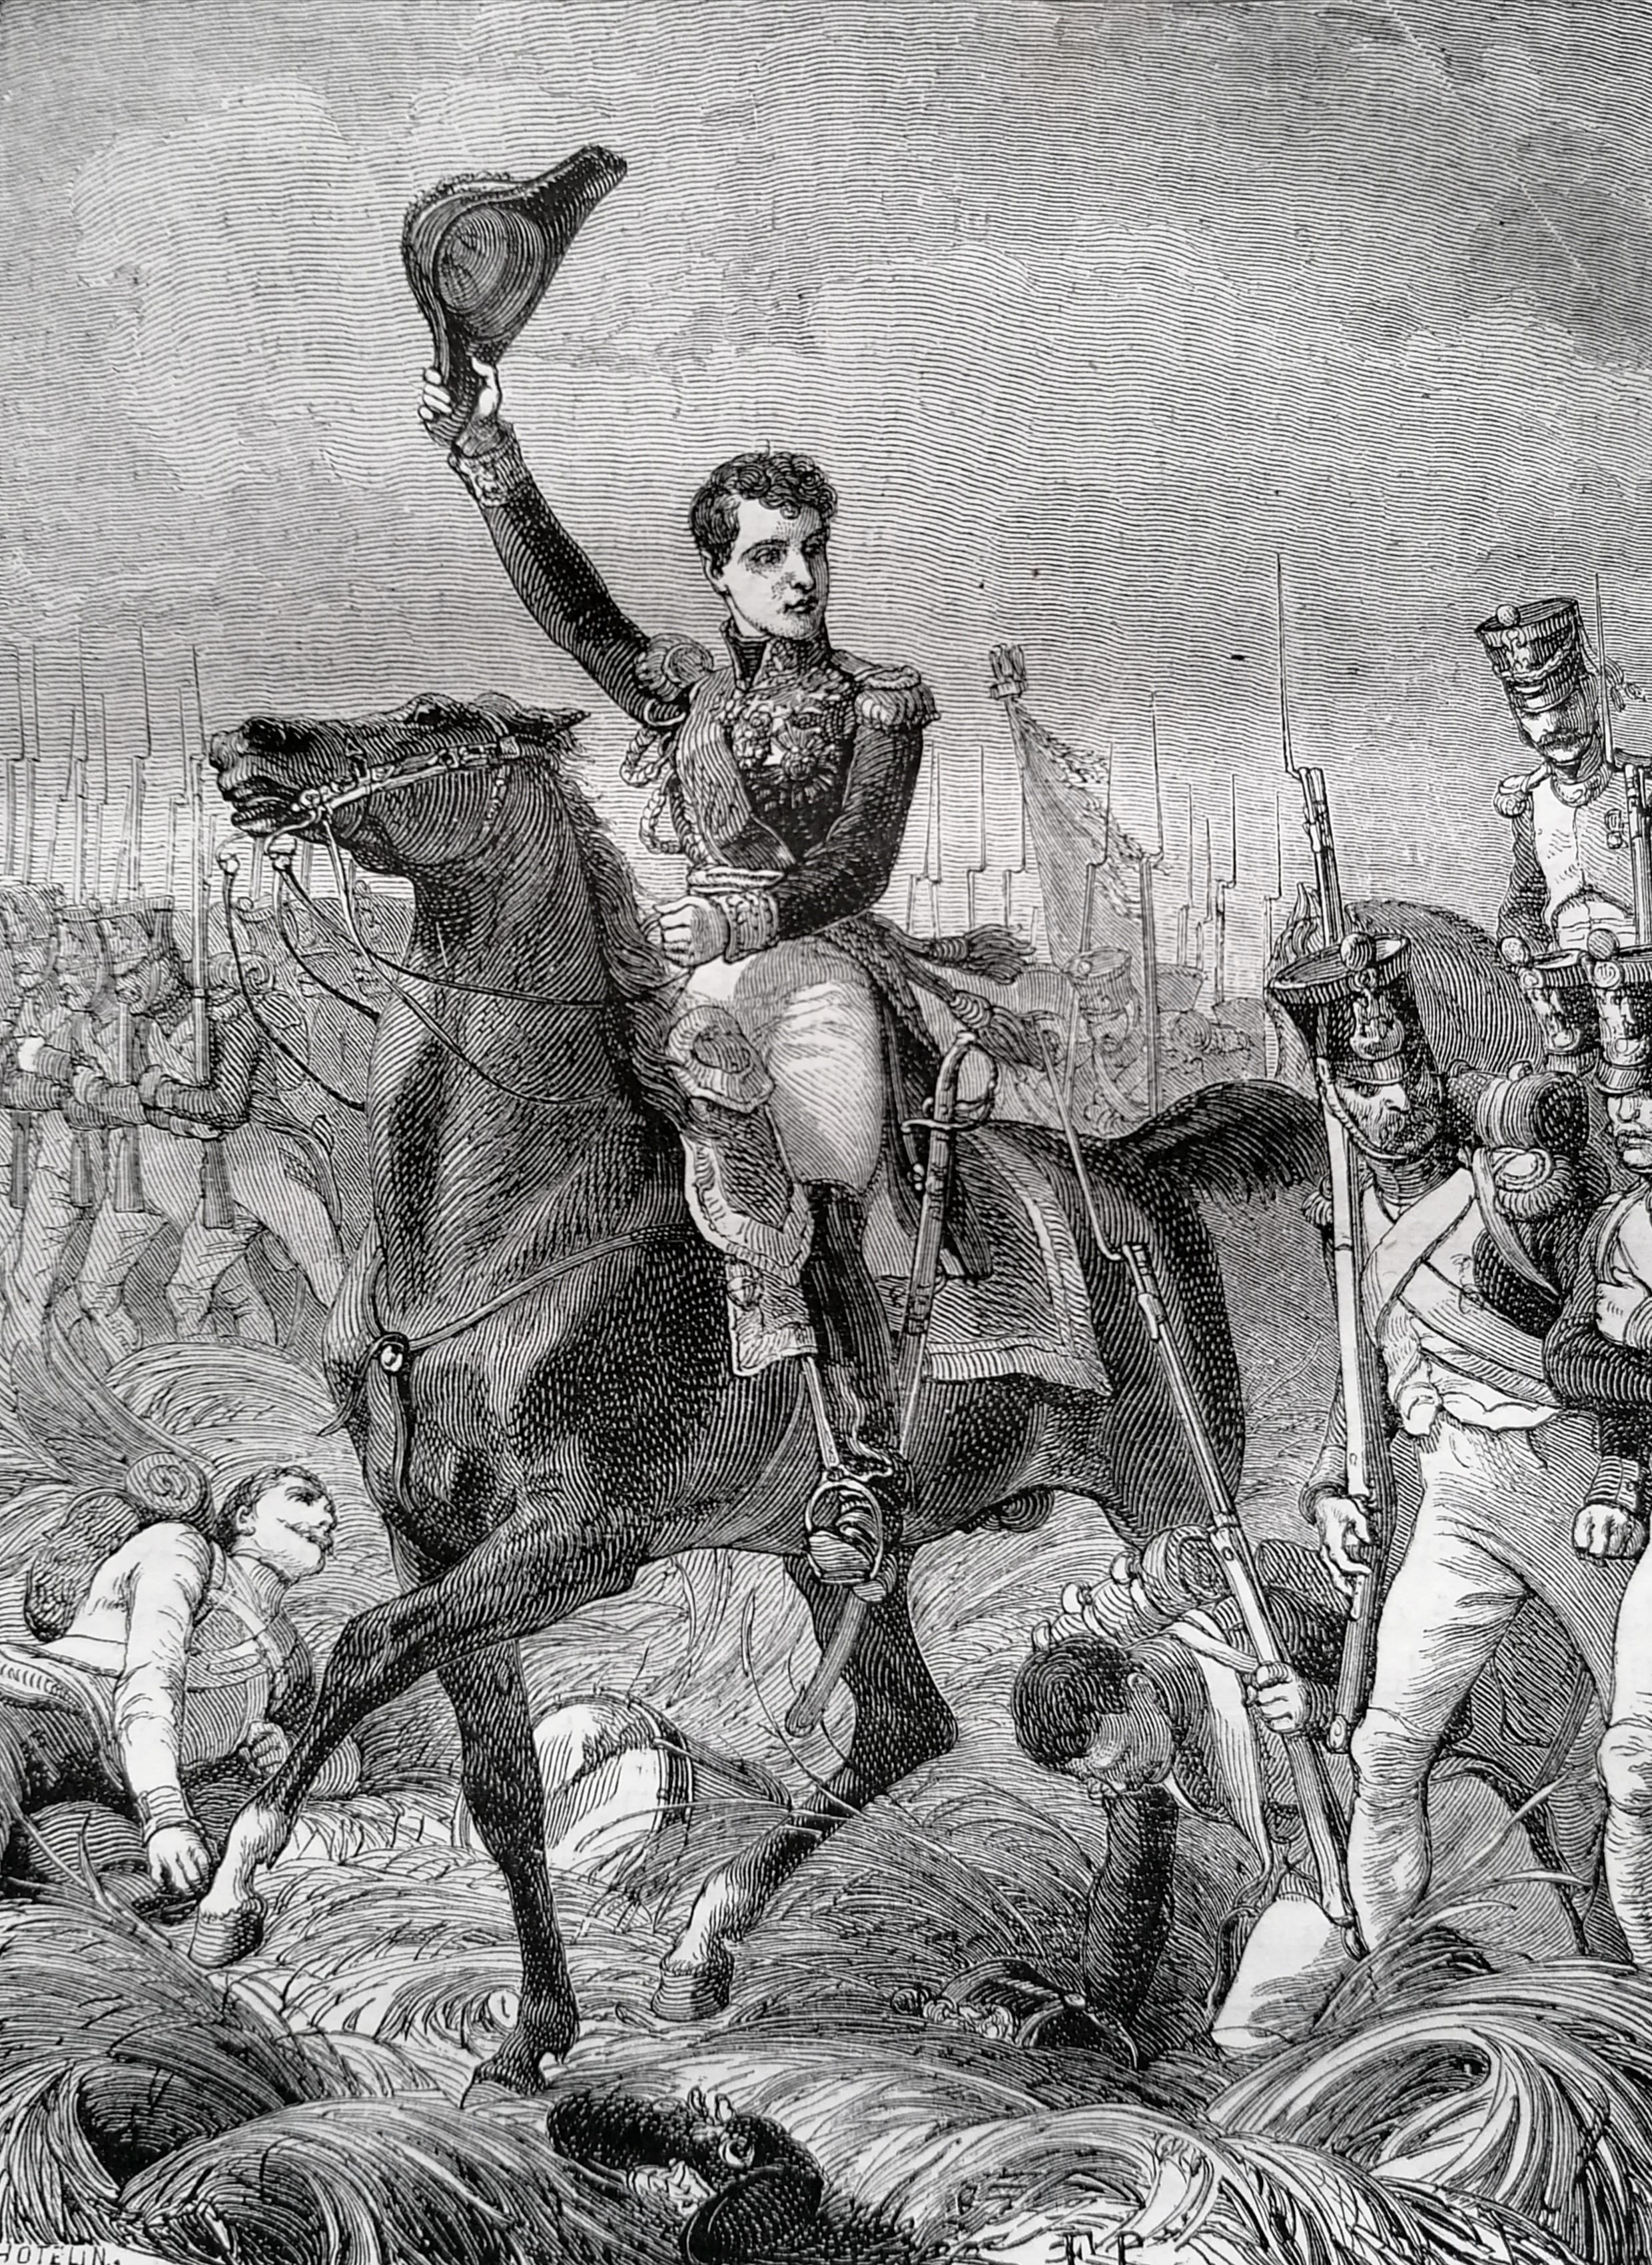 File:Le général Gudin en campagne.jpg - Wikimedia Commons